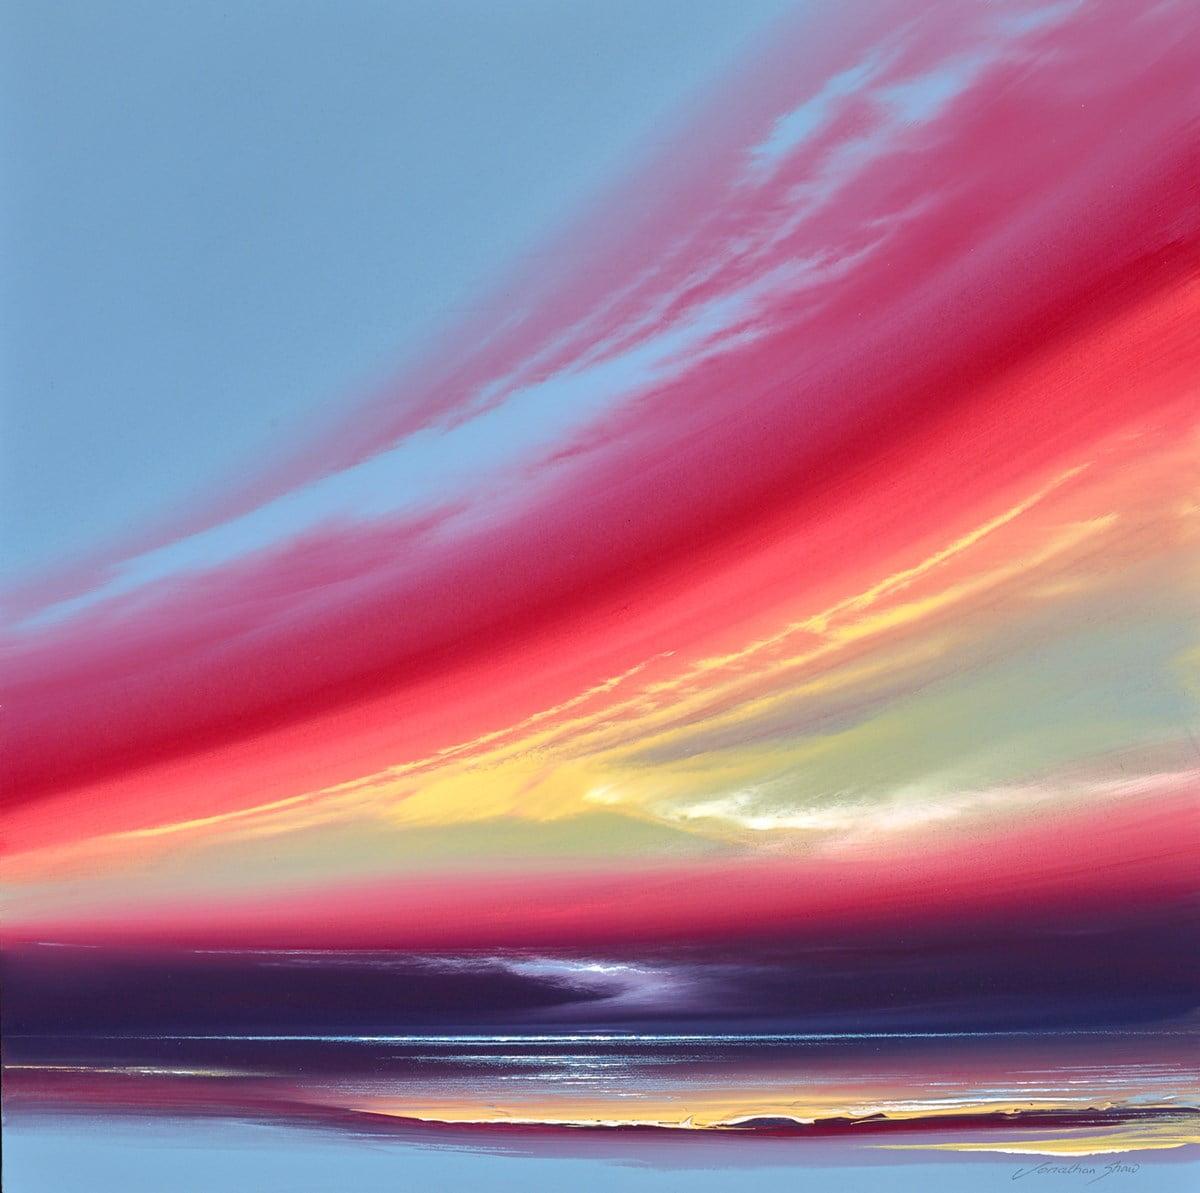 Twilight Sky ~ Jonathan Shaw